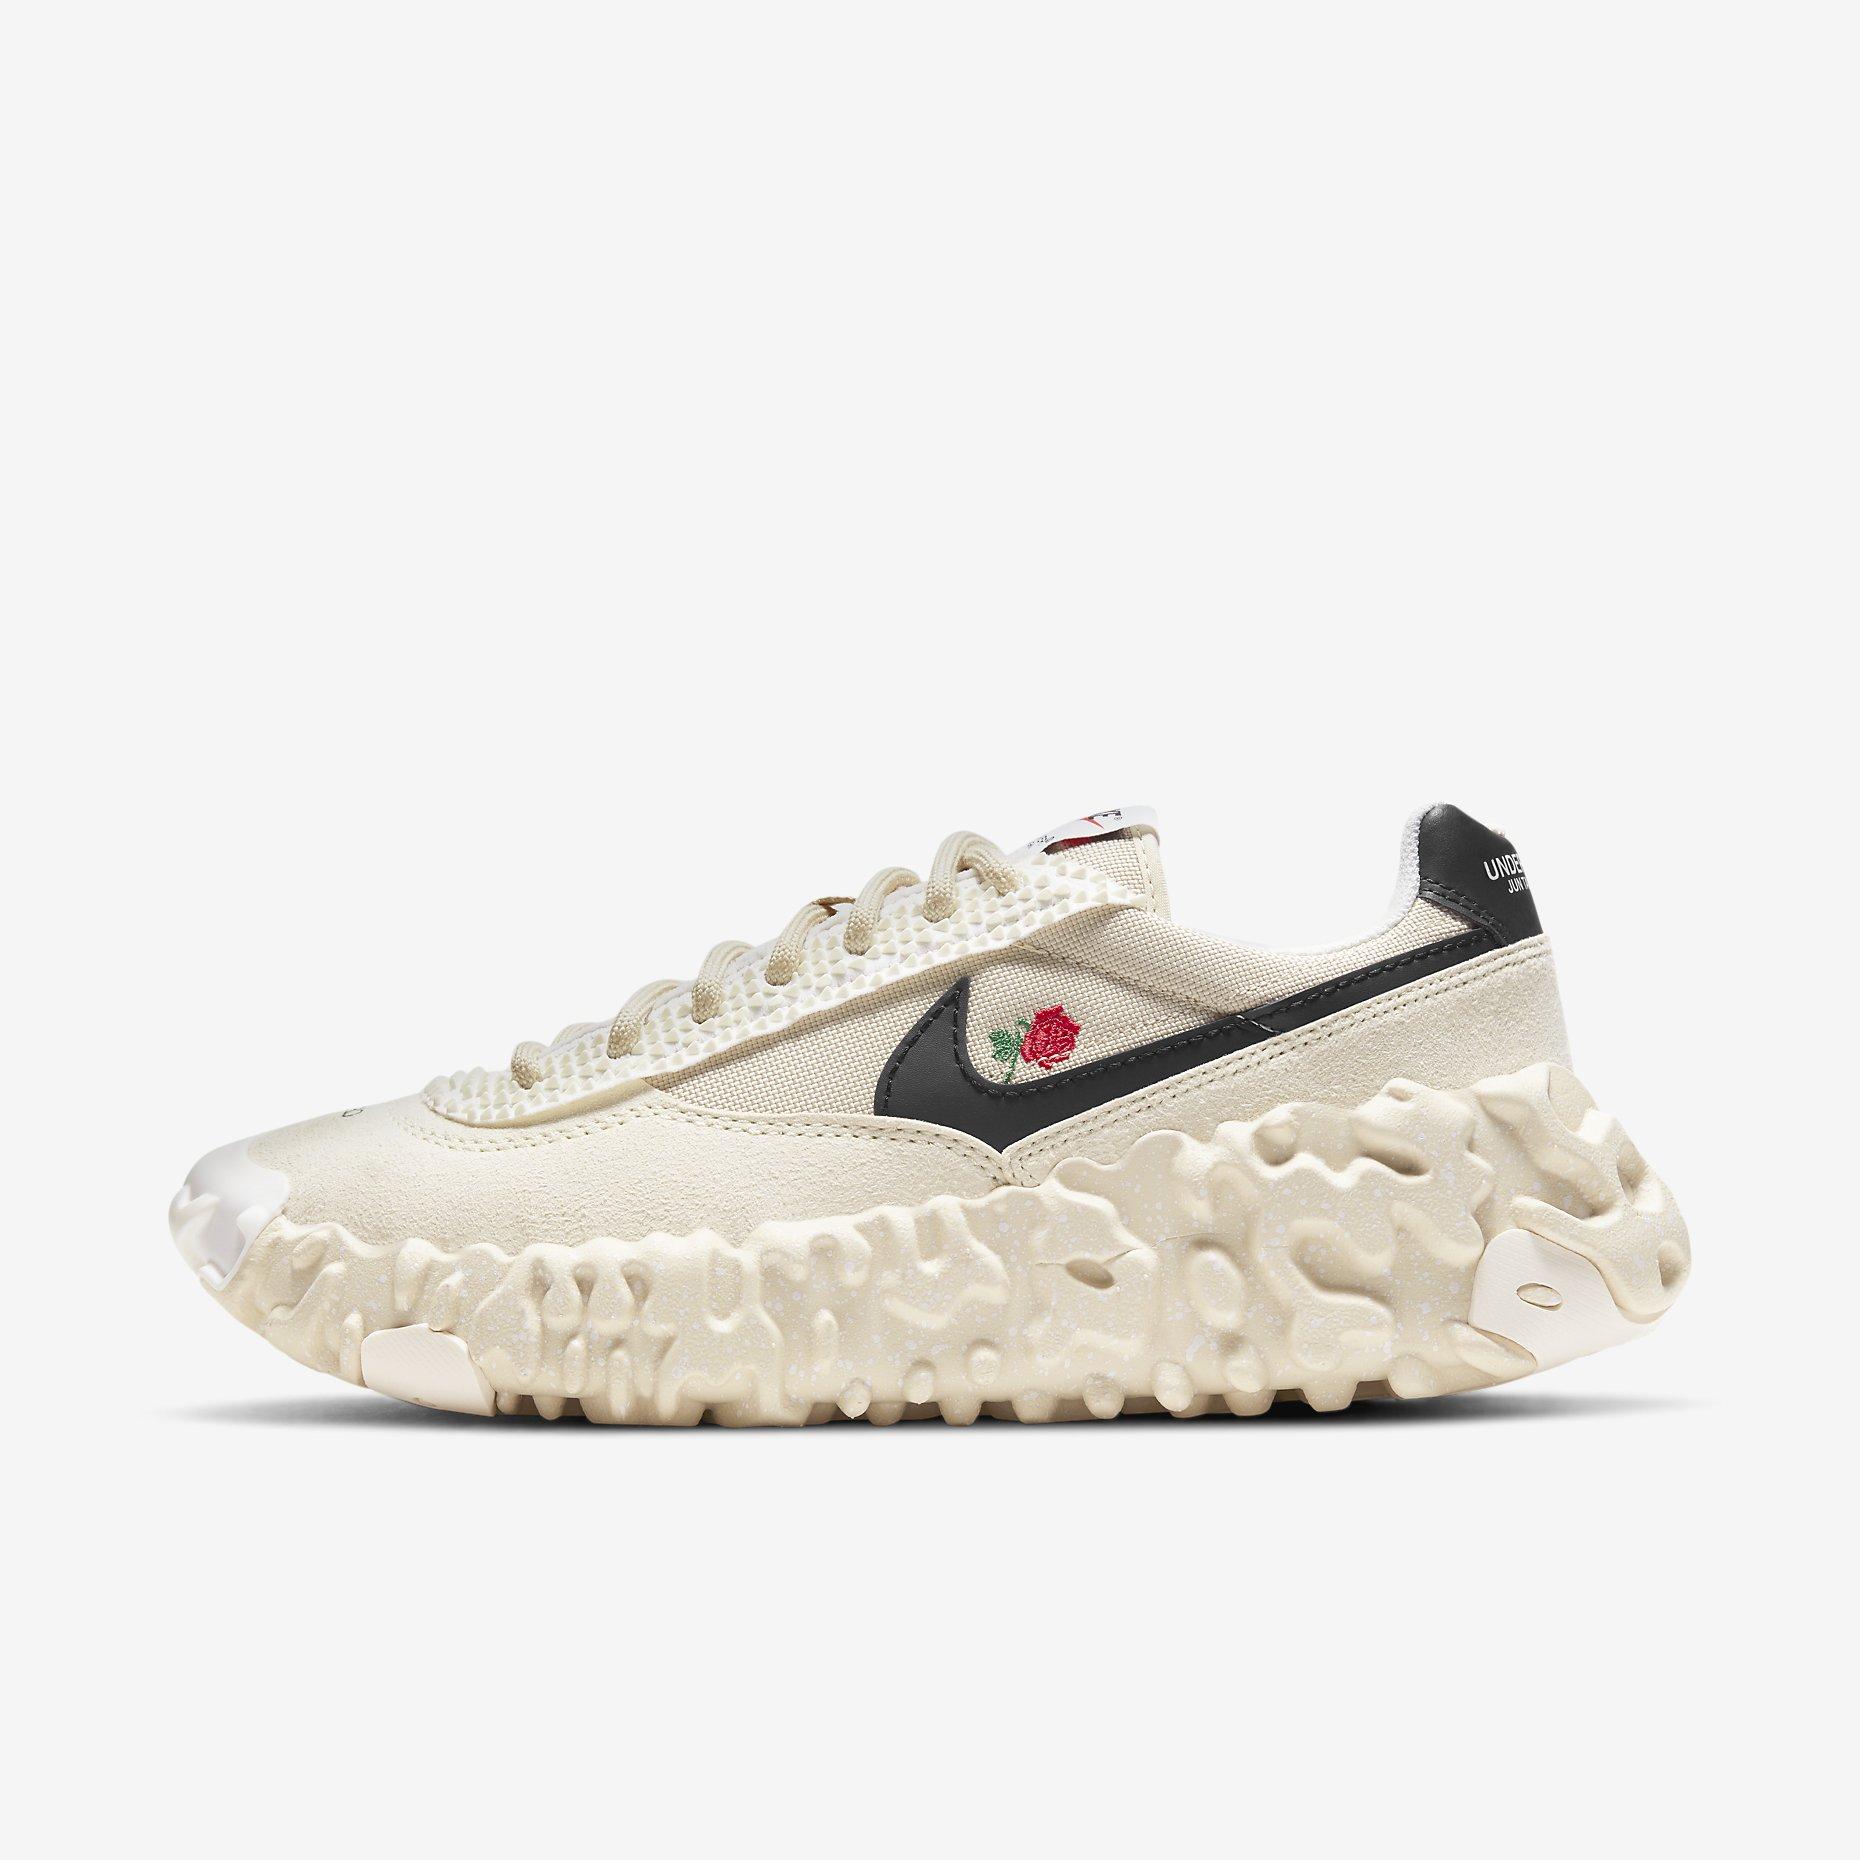 Undercover x Nike Overbreak 'Overcast'}